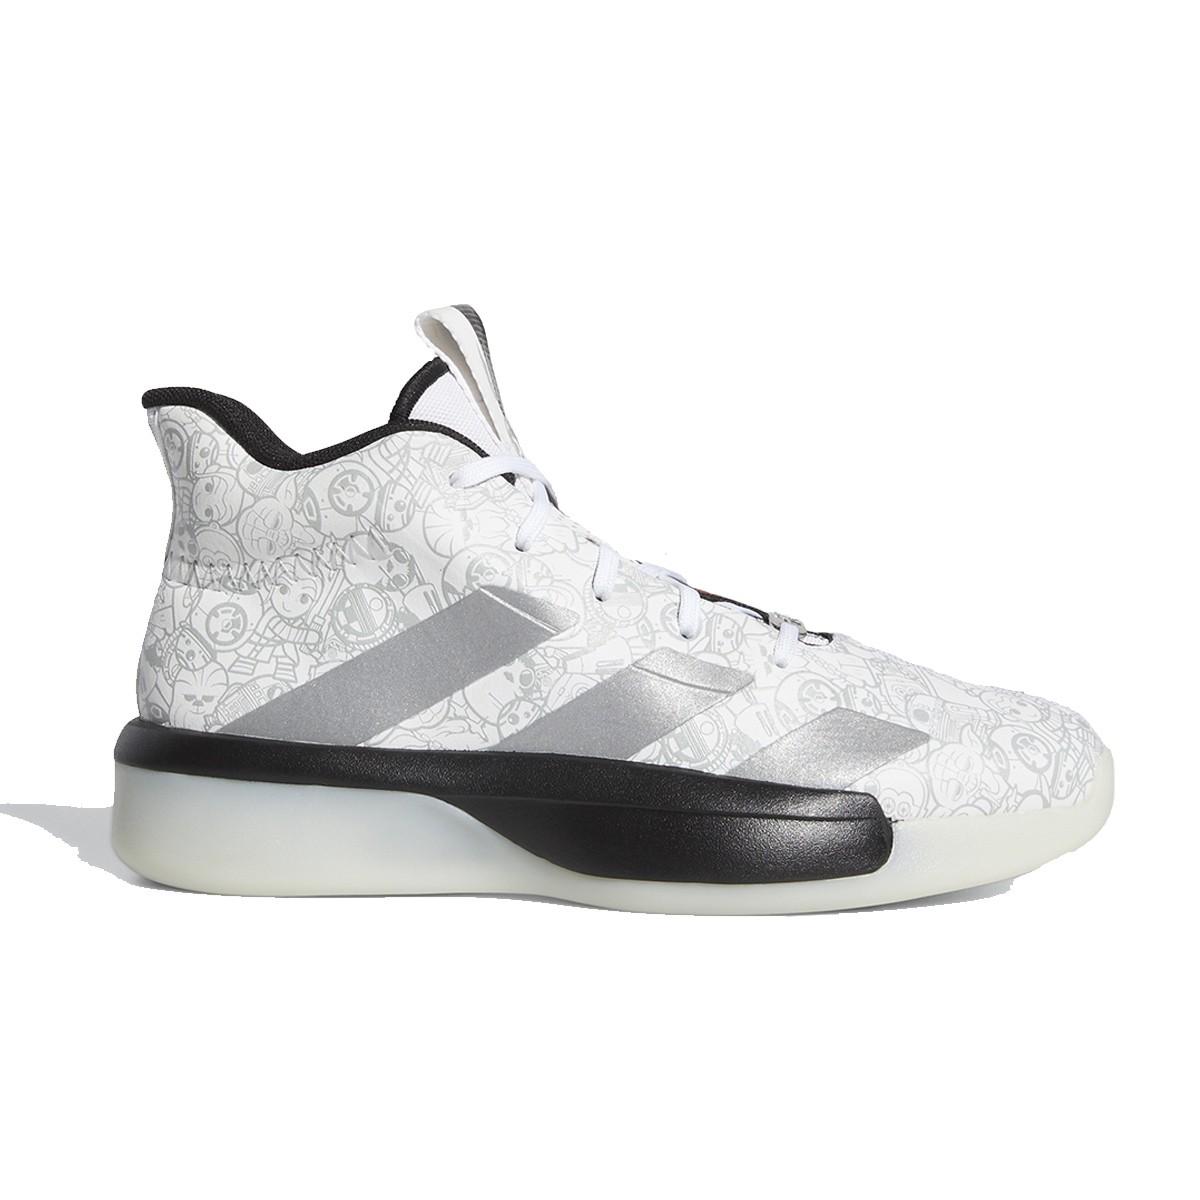 zapatillas adidas hombre 2019 baloncesto